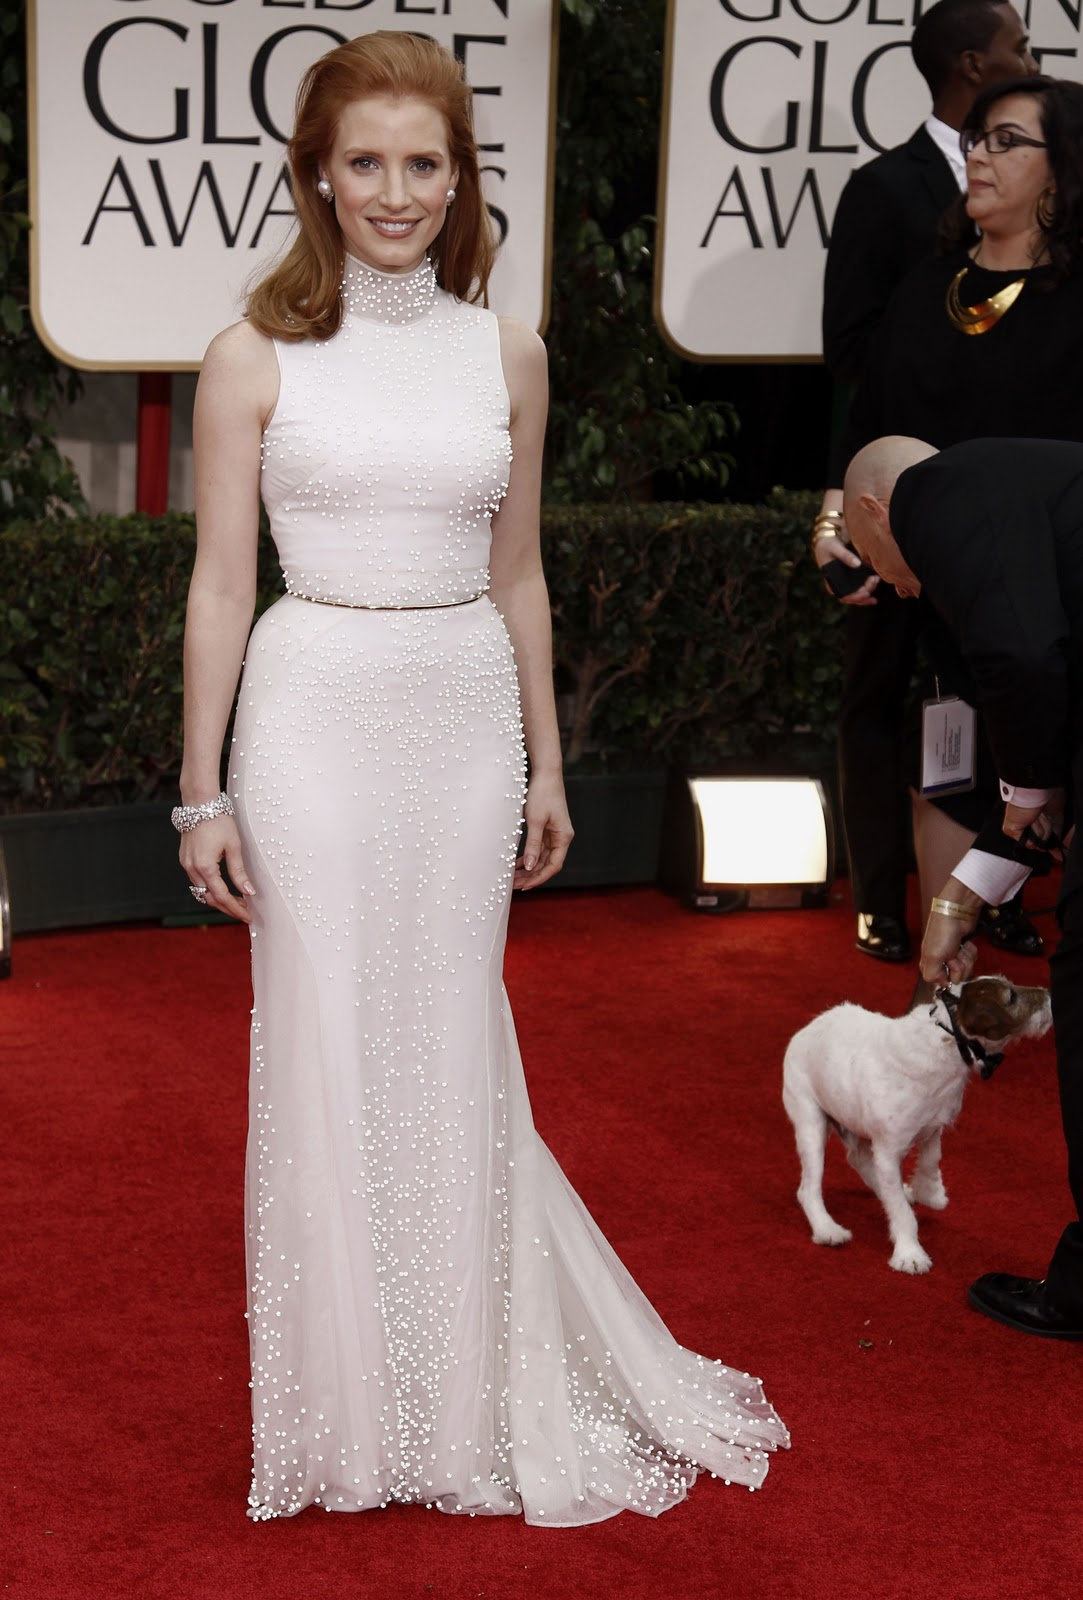 http://1.bp.blogspot.com/-yYzYW8bvsiE/TxQhUfomnfI/AAAAAAAAOY4/HxNTVKdCI3M/s1600/CU-Jessica+Chastain+arrives+at+the+69th+Annual+Golden+Globe+Awards-02.jpg